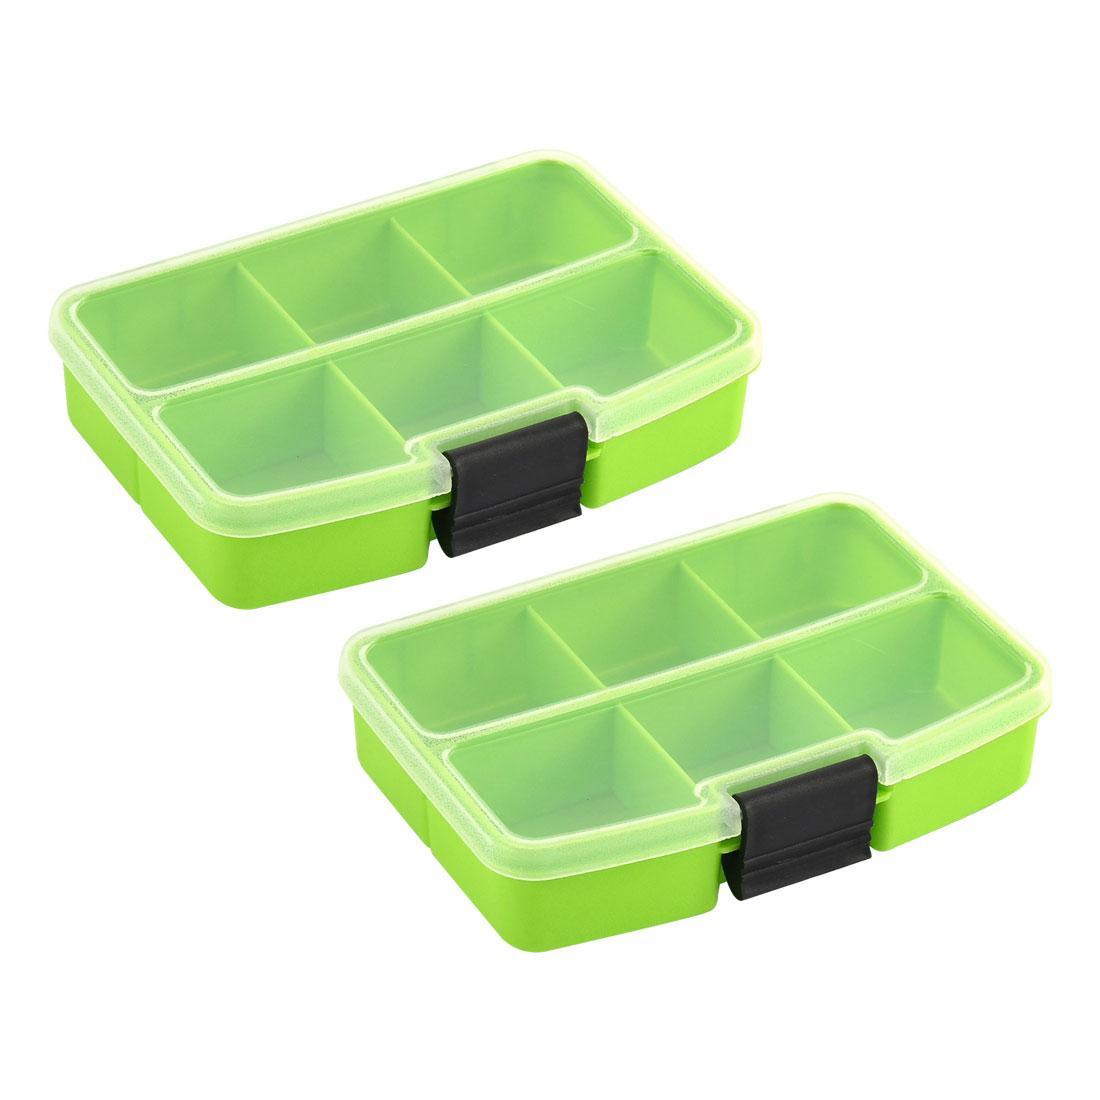 Desktop Plastic Rectangle 6 Compartments Storage Box Organizer Green 2pcs